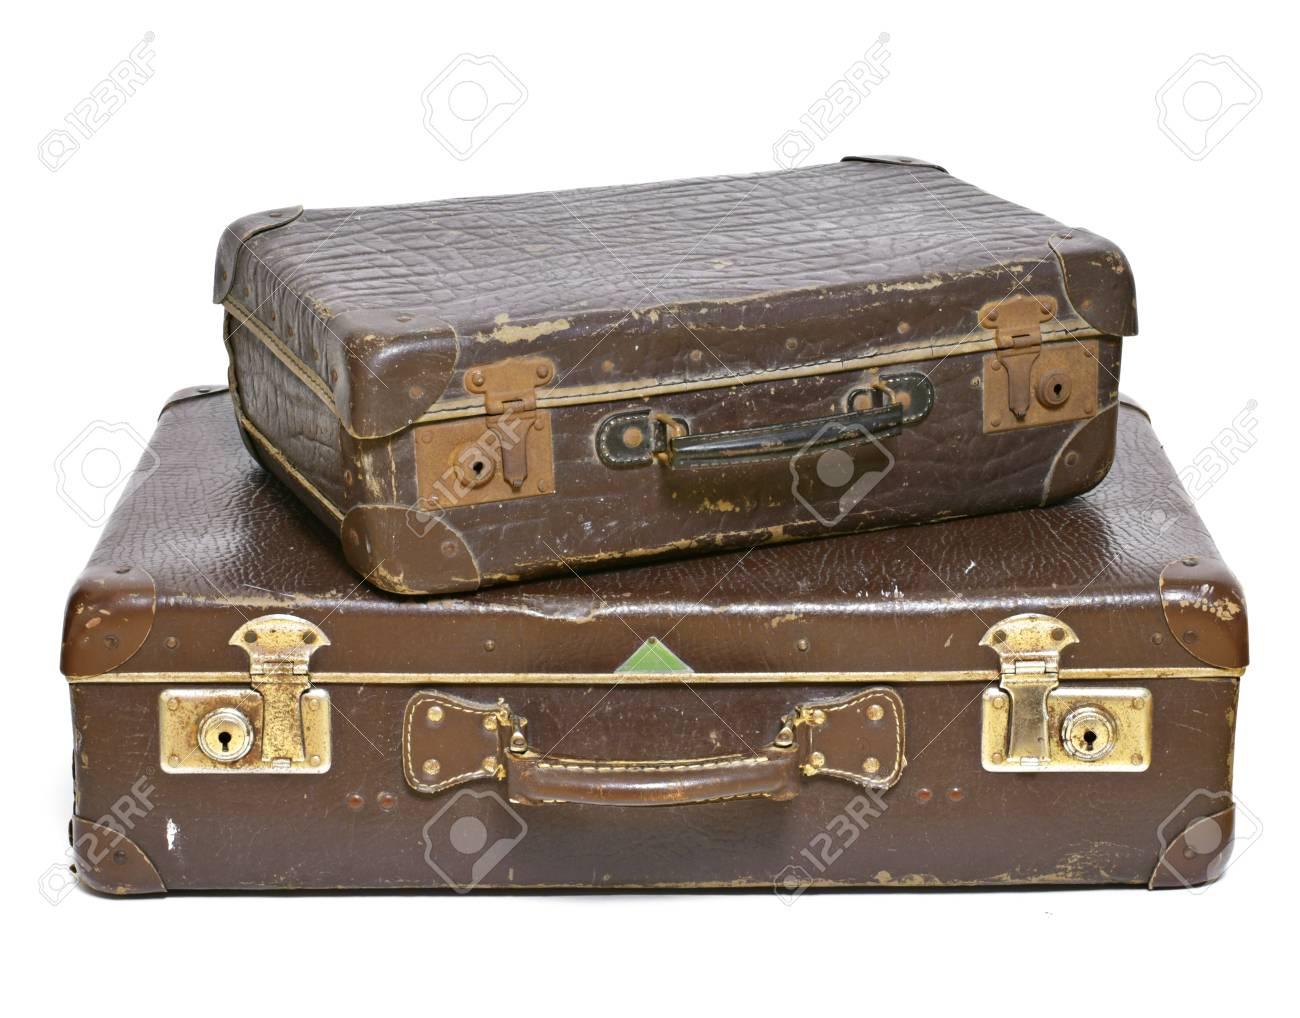 old suitcase travel item luggage or baggage vintage suitcase